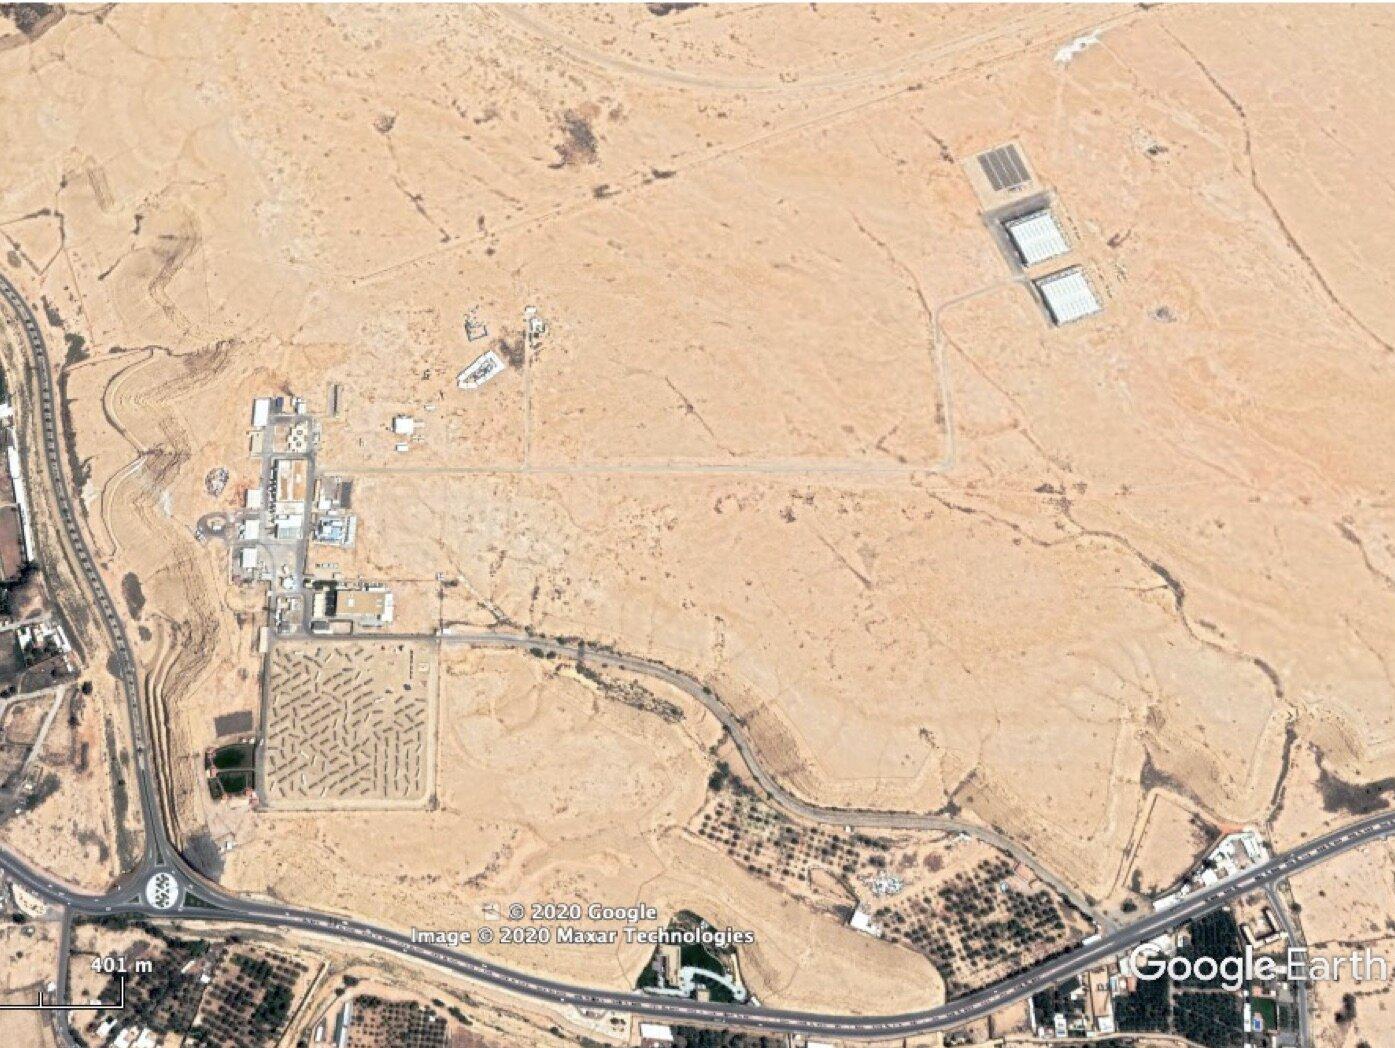 13990516000162 Test NewPhotoFree - نیویورک تایمز | گمانهزنیها درباره سایت هستهای مخفی عربستان در اطراف ریاض